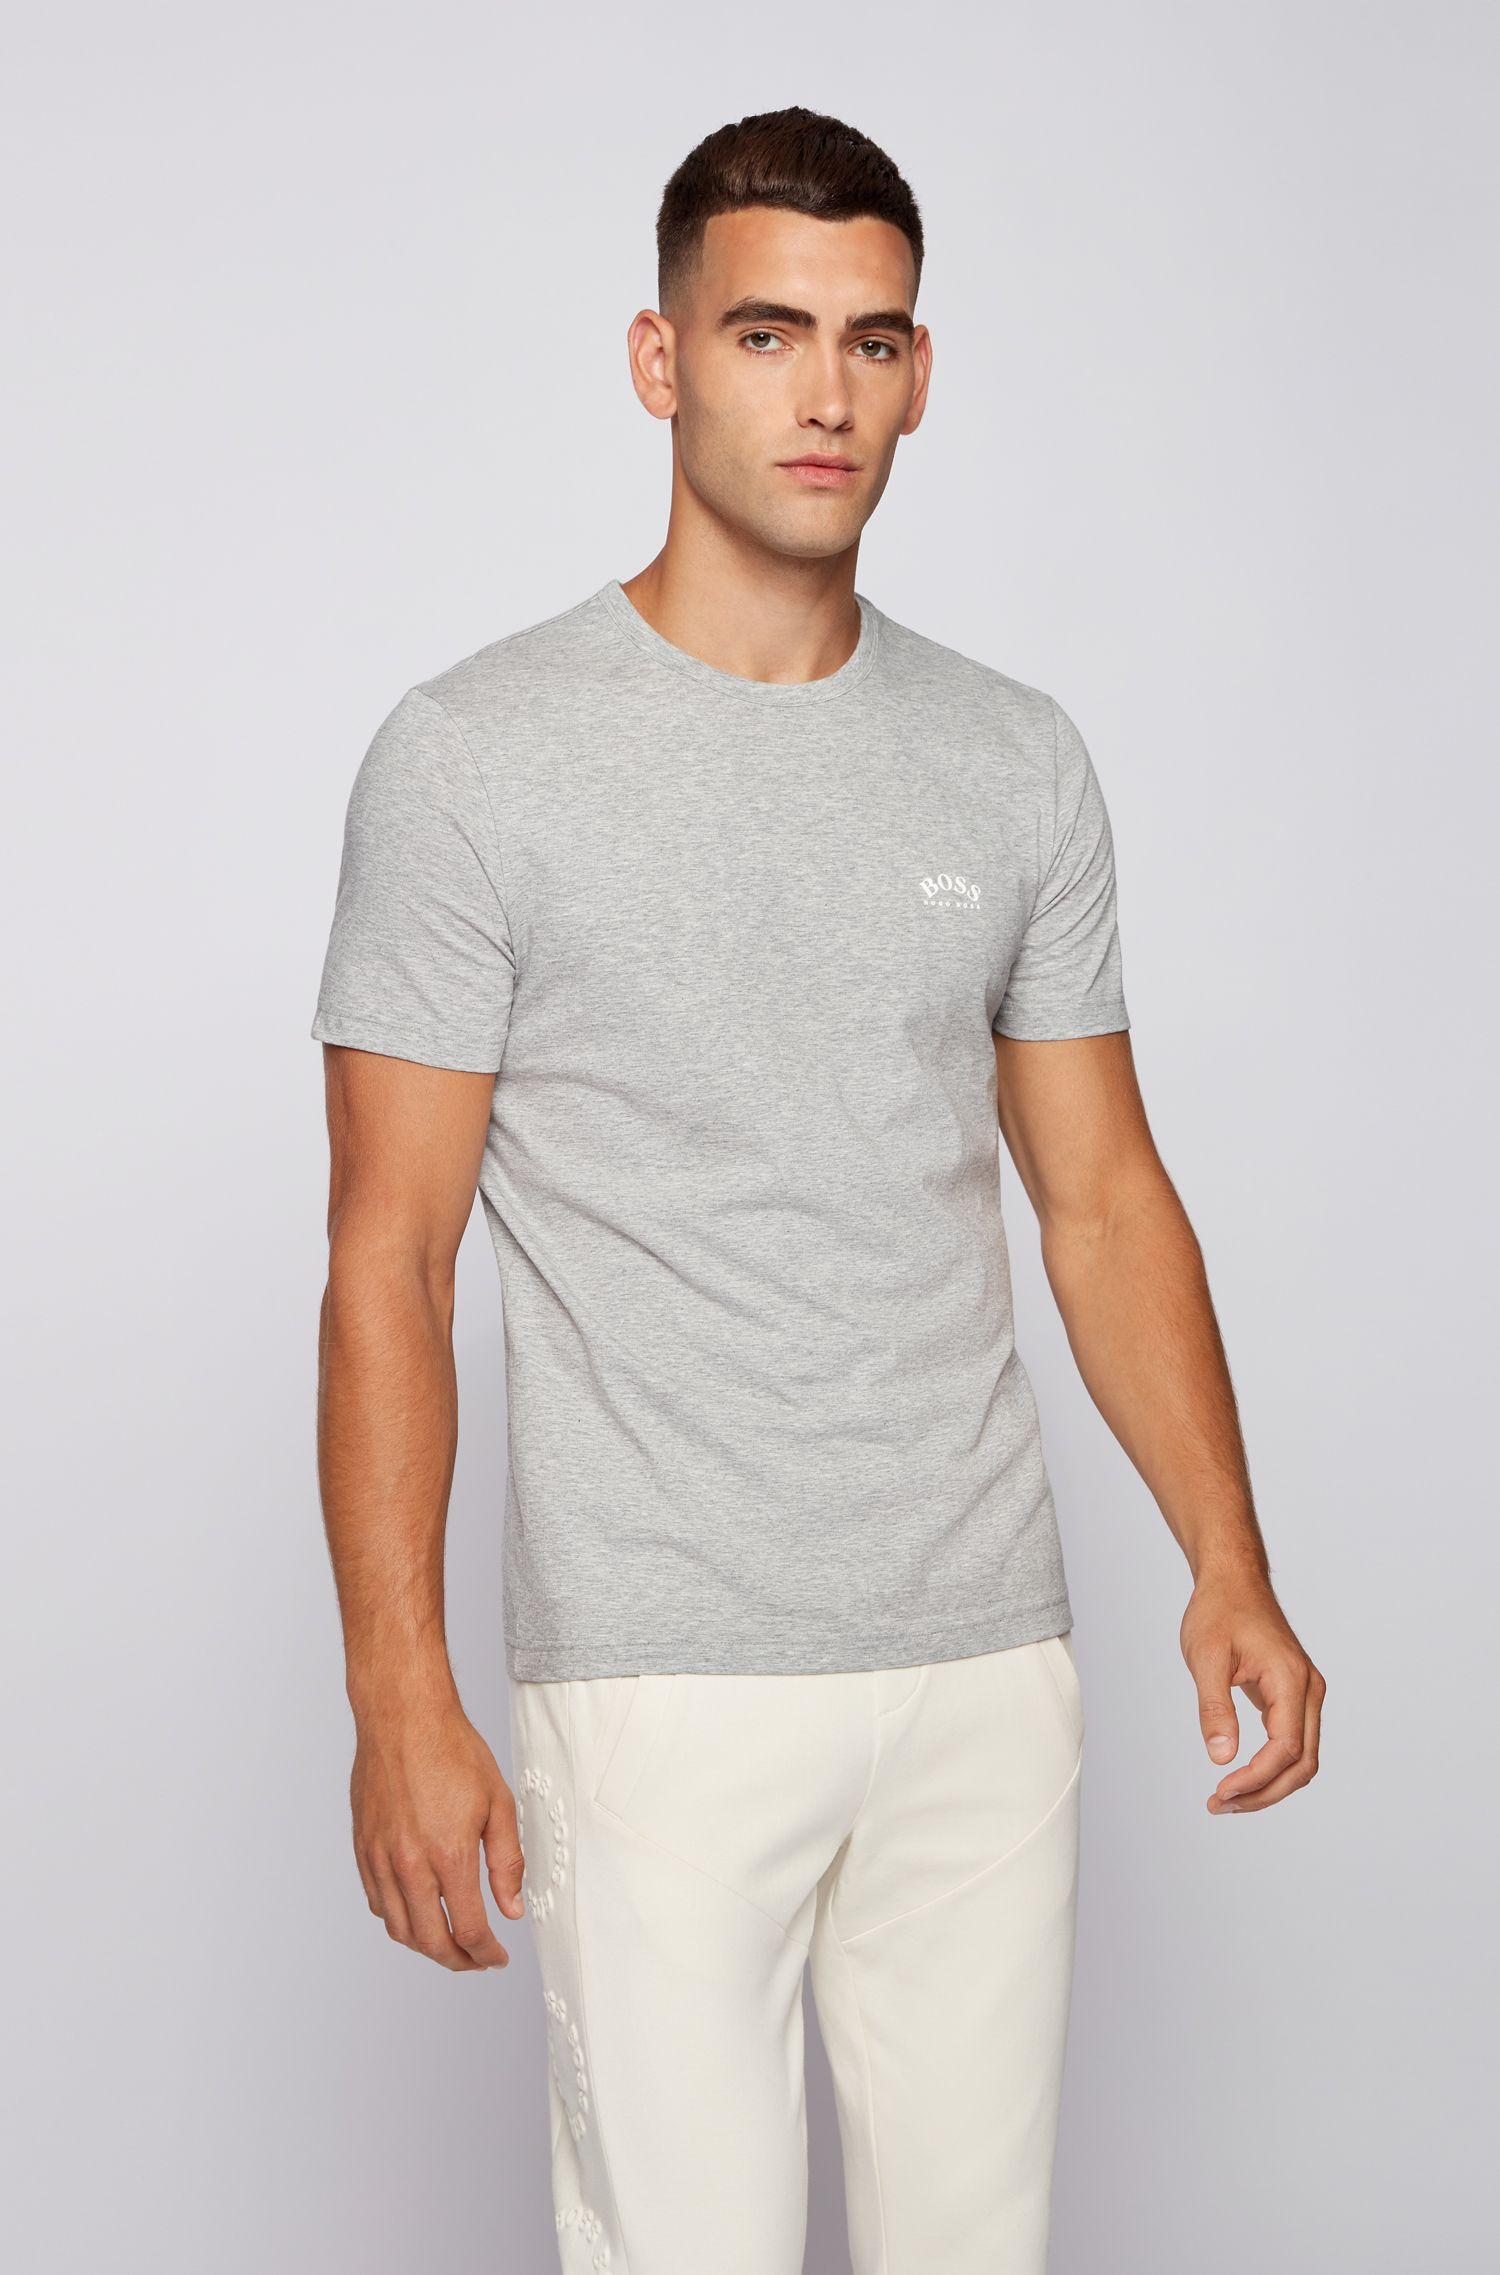 HUGO BOSS 雨果博斯 纯棉 男式短袖T恤 S码4.6折$26.66 海淘转运到手约¥185